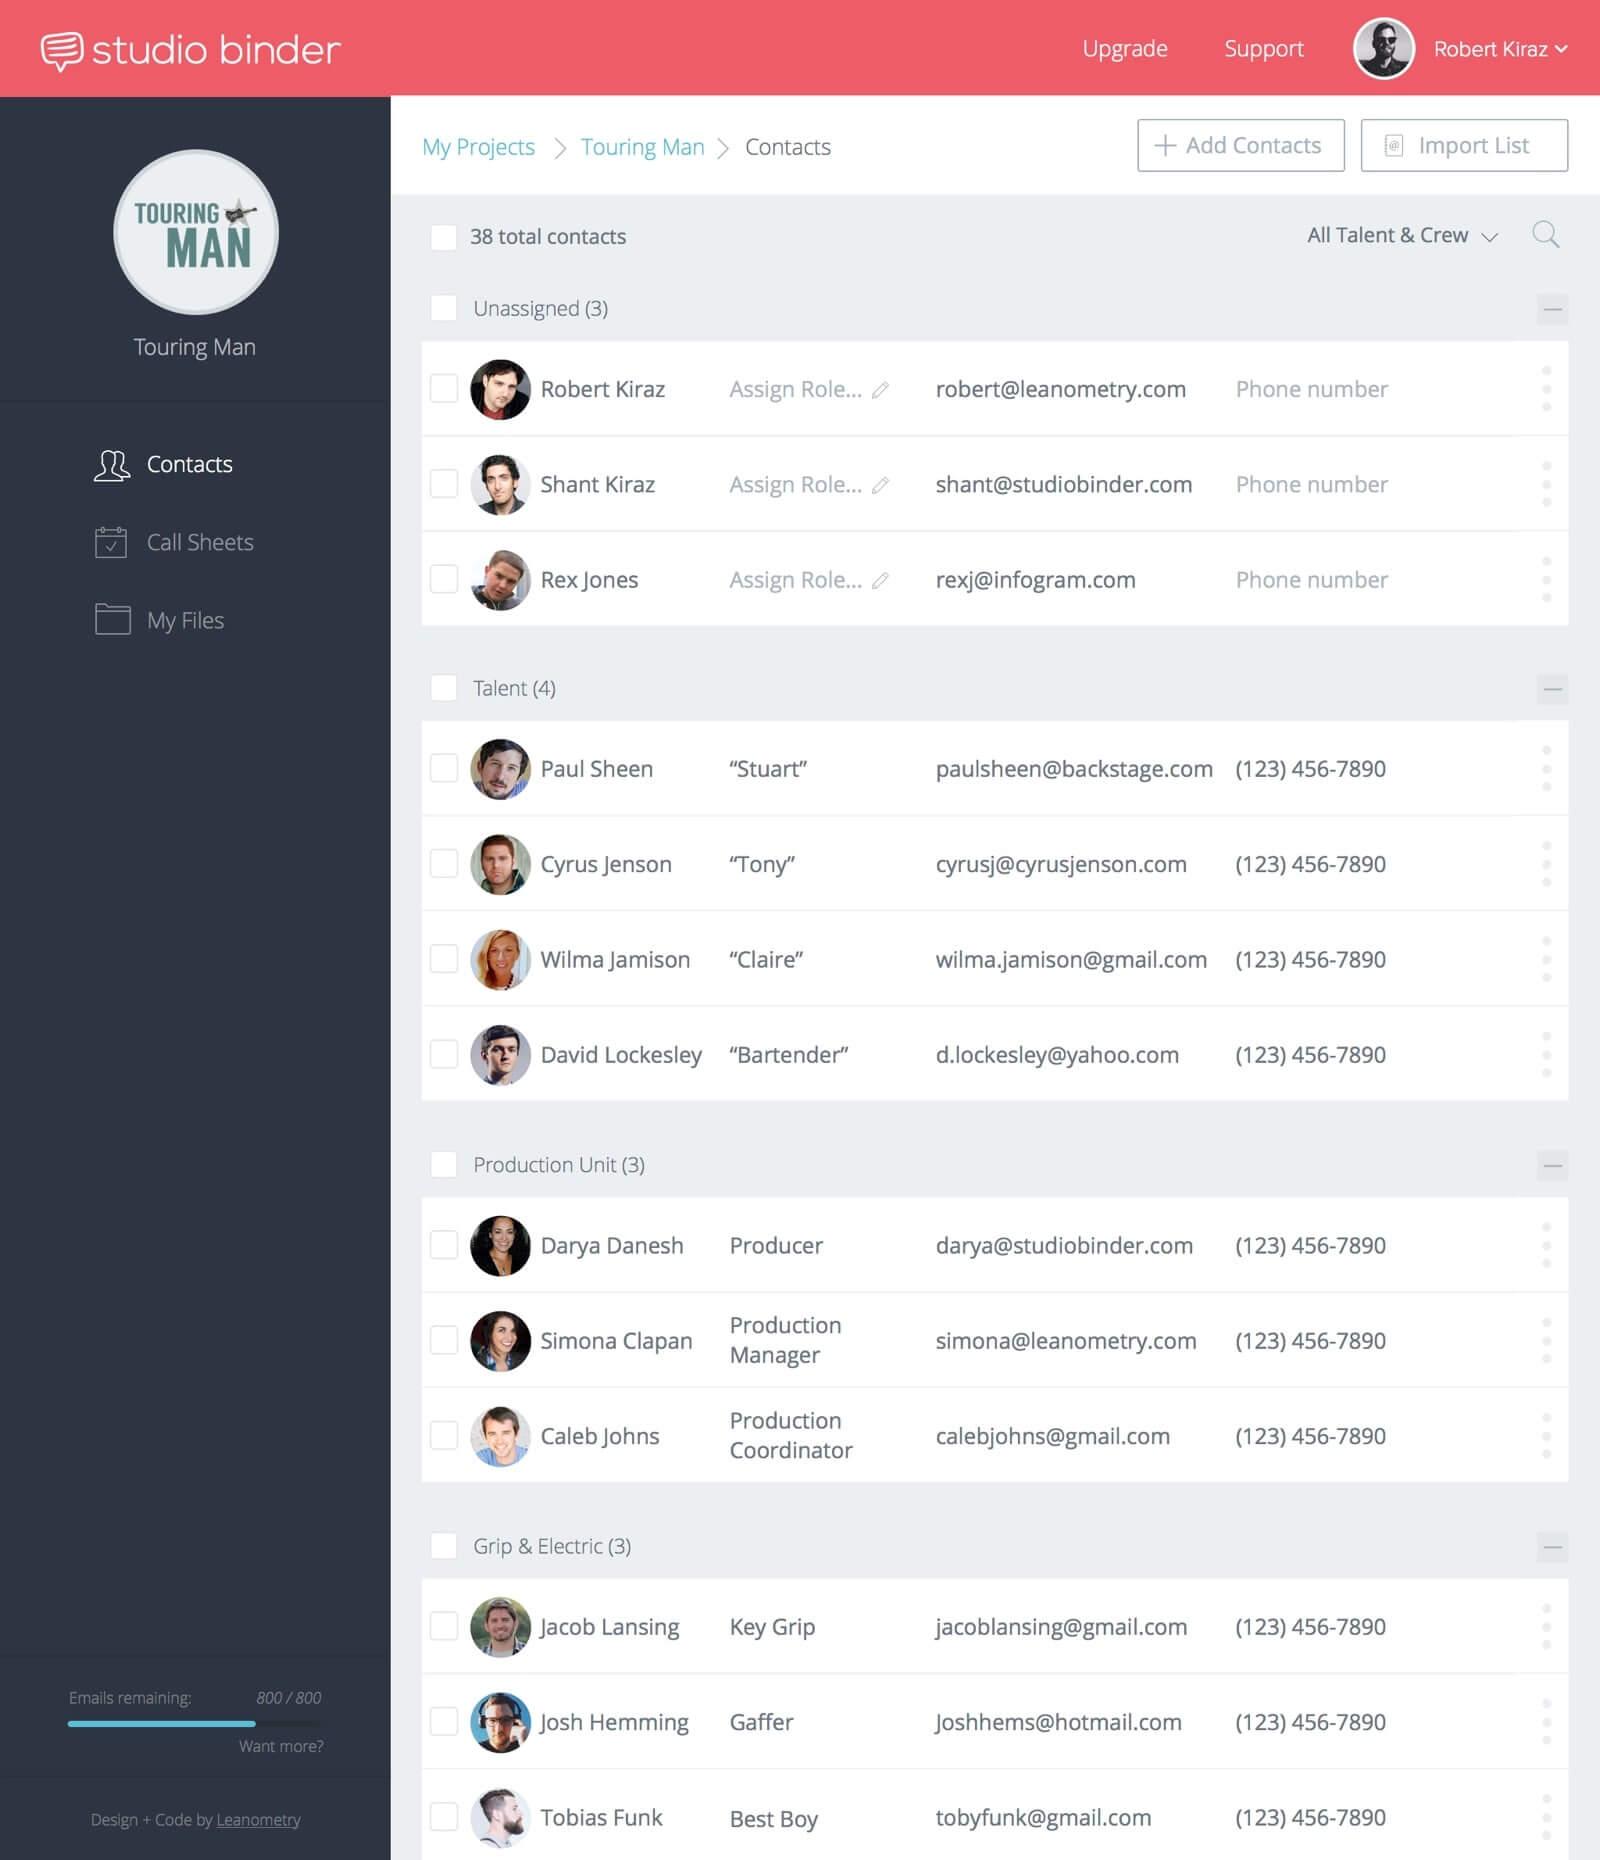 Filmmaking Software - Call Sheet Template Contacts - StudioBinder